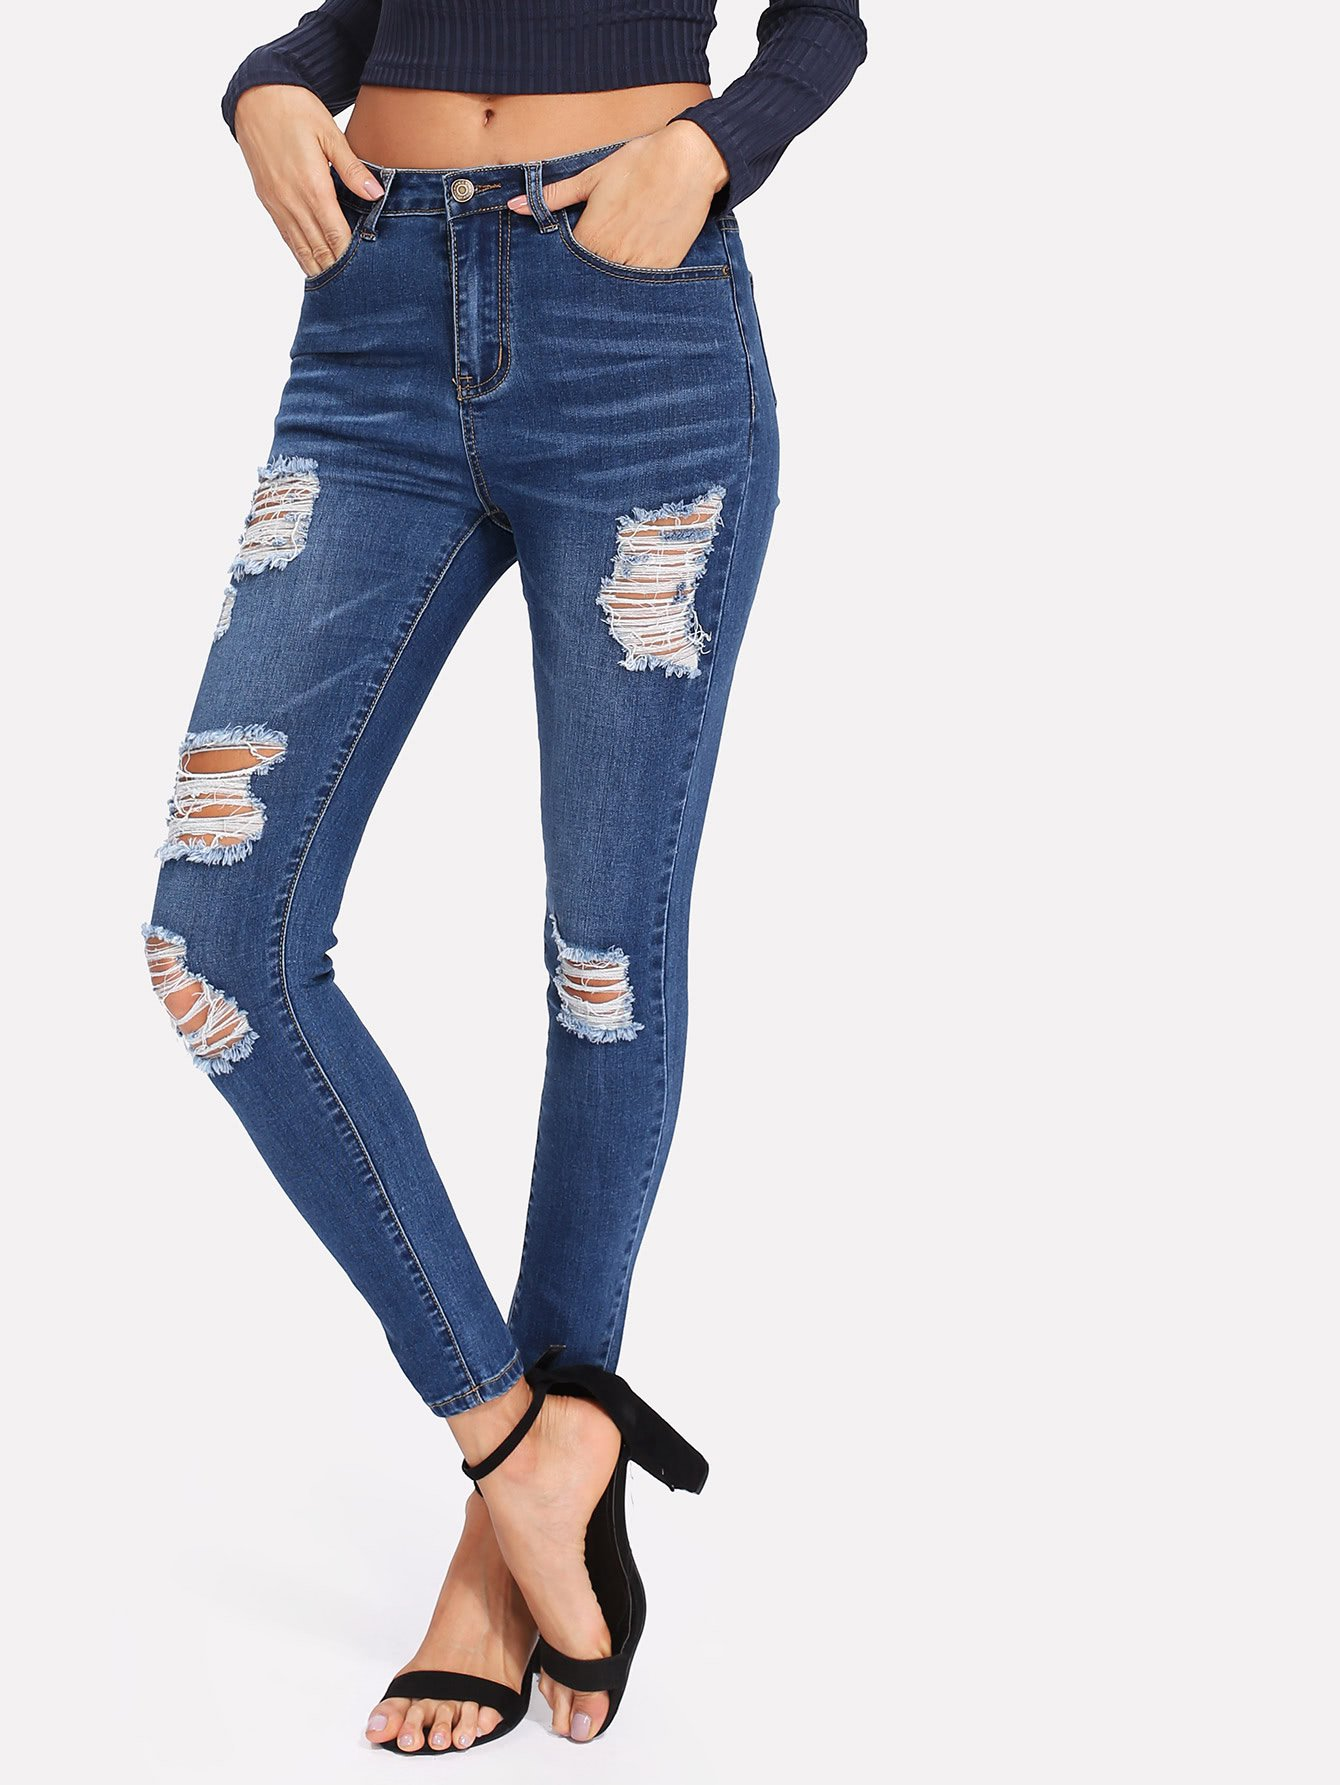 Bleach Wash Shredded Skinny Jeans